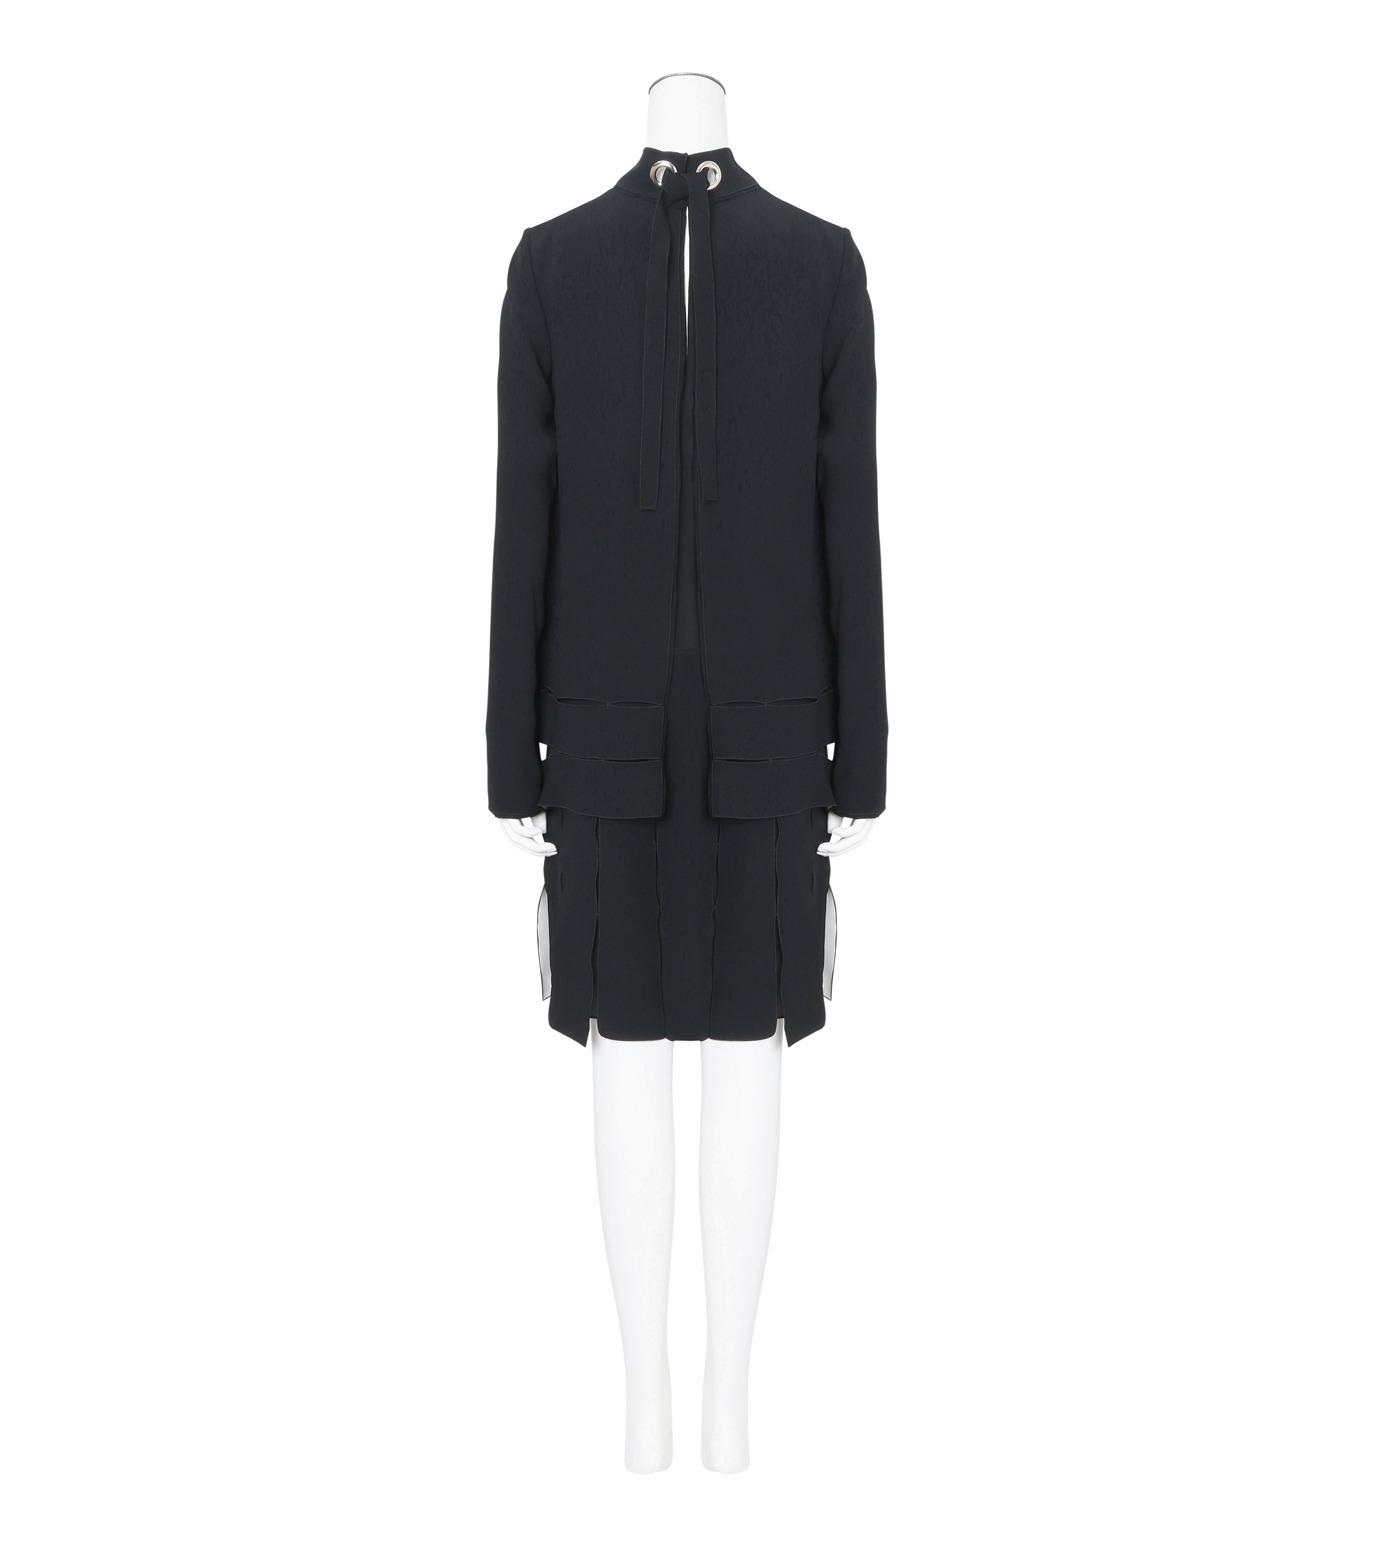 Proenza Schouler(プロエンザ スクーラー)のLS Drop Waist Dress Satin Bonded-BLACK(ワンピース/one piece)-R164342-13 拡大詳細画像2